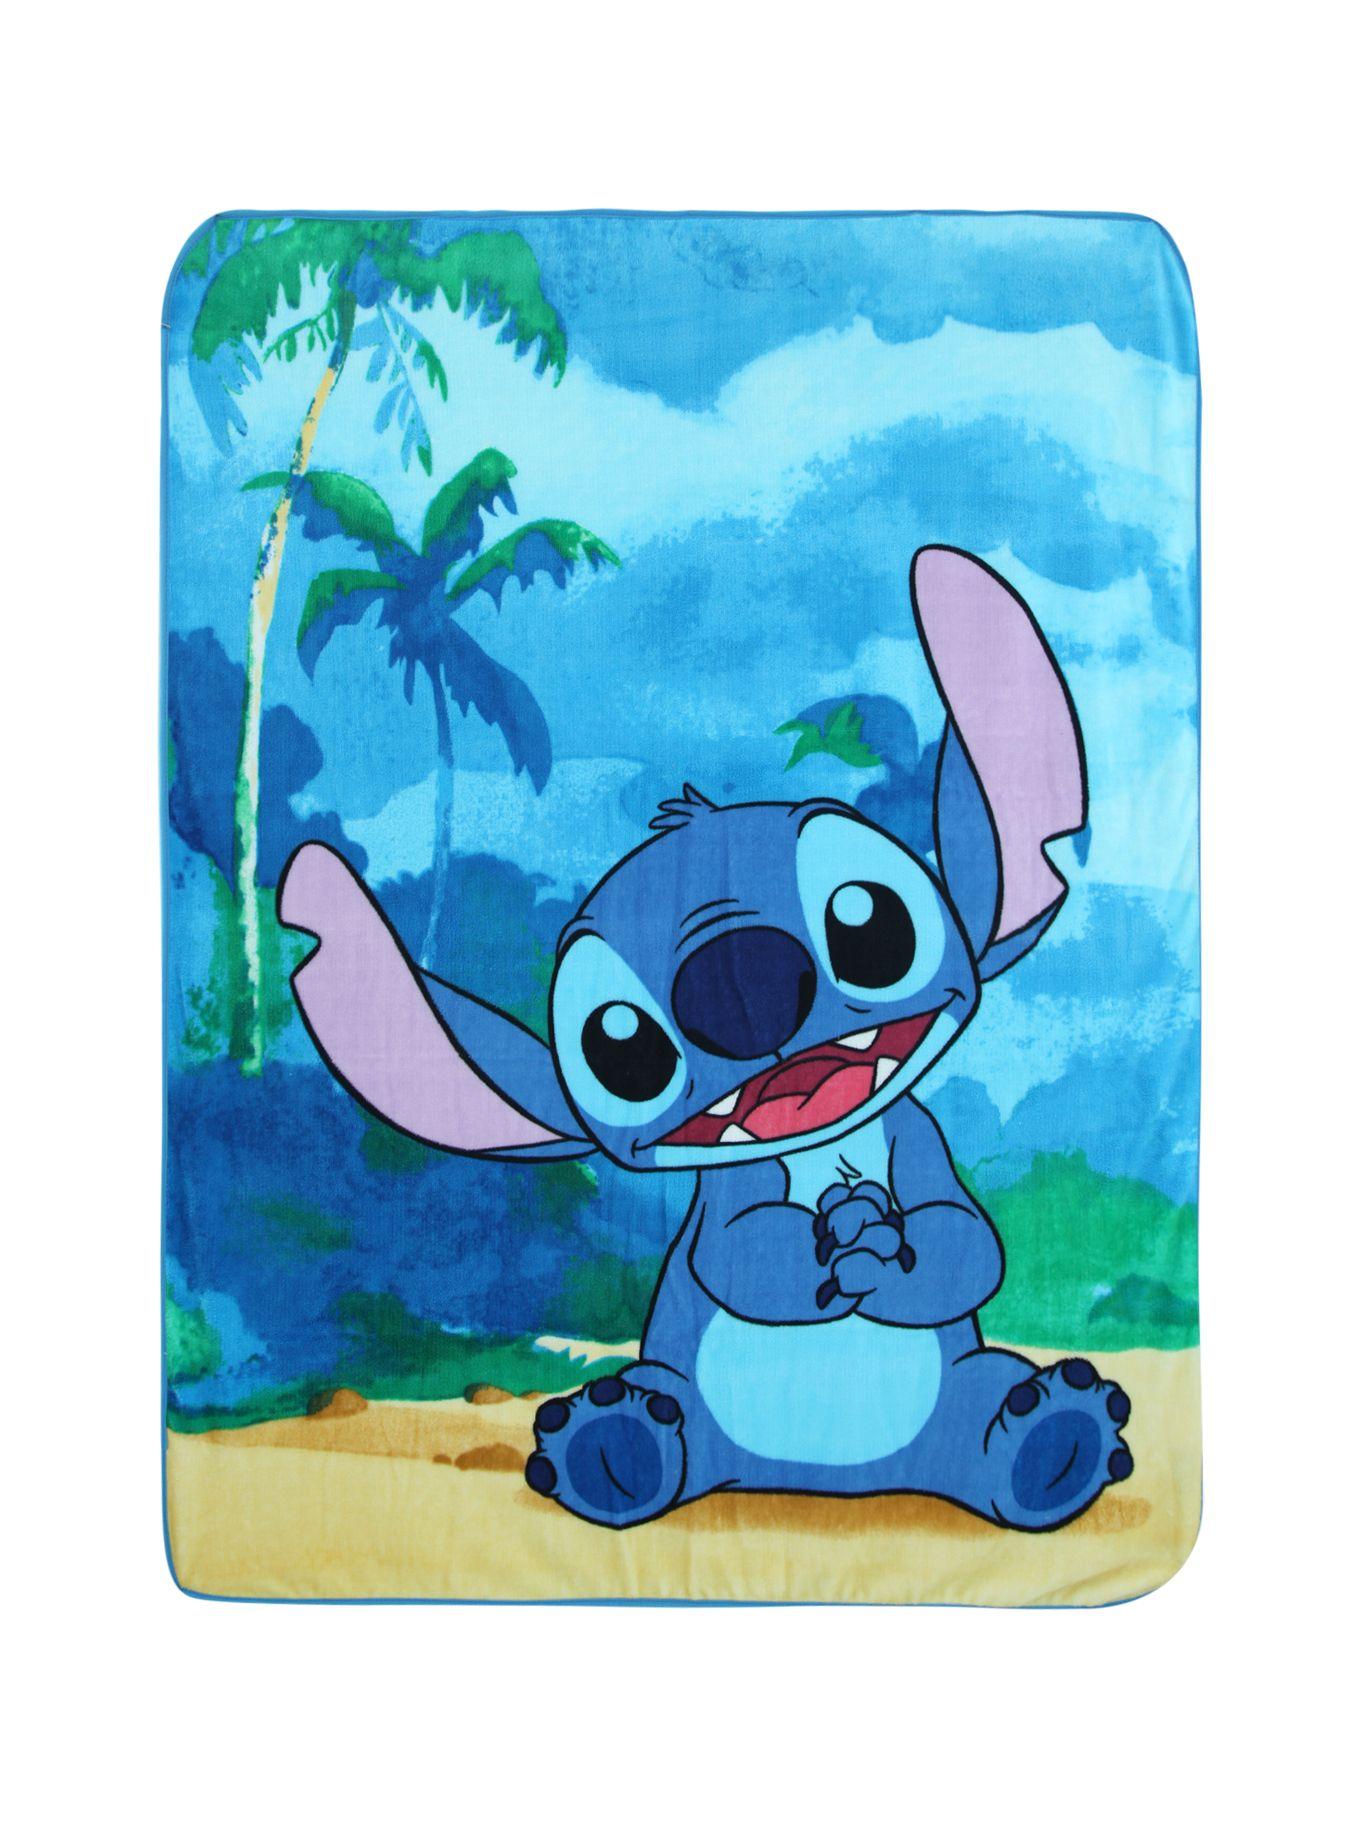 Disney Lilo Stitch Stitch Super Plush Throw Hot Topic Dessins Disney Dessin Disney